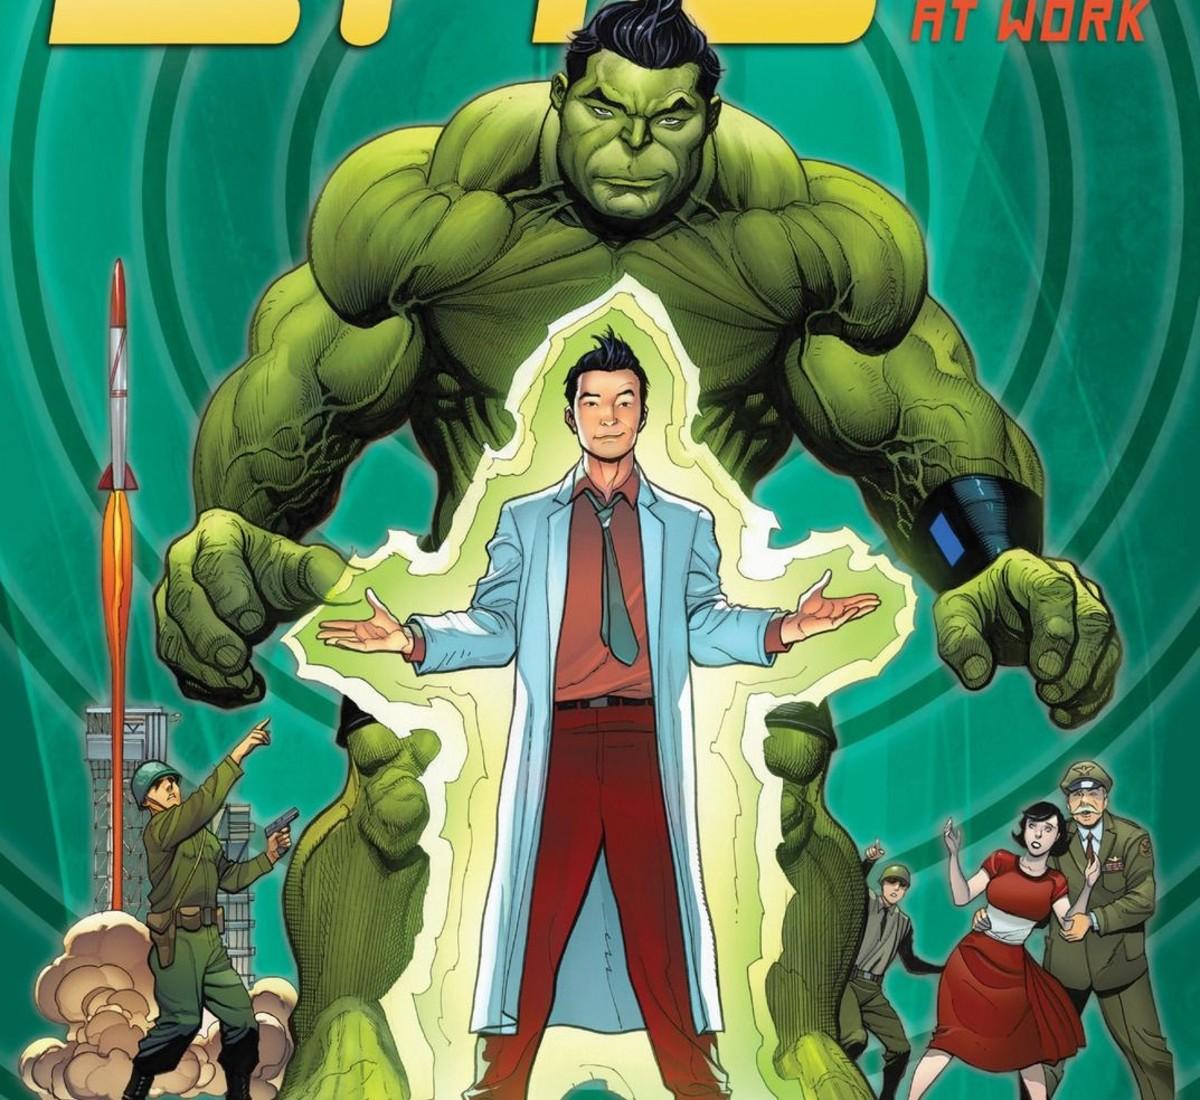 Amadeus Cho in Hulk transformation